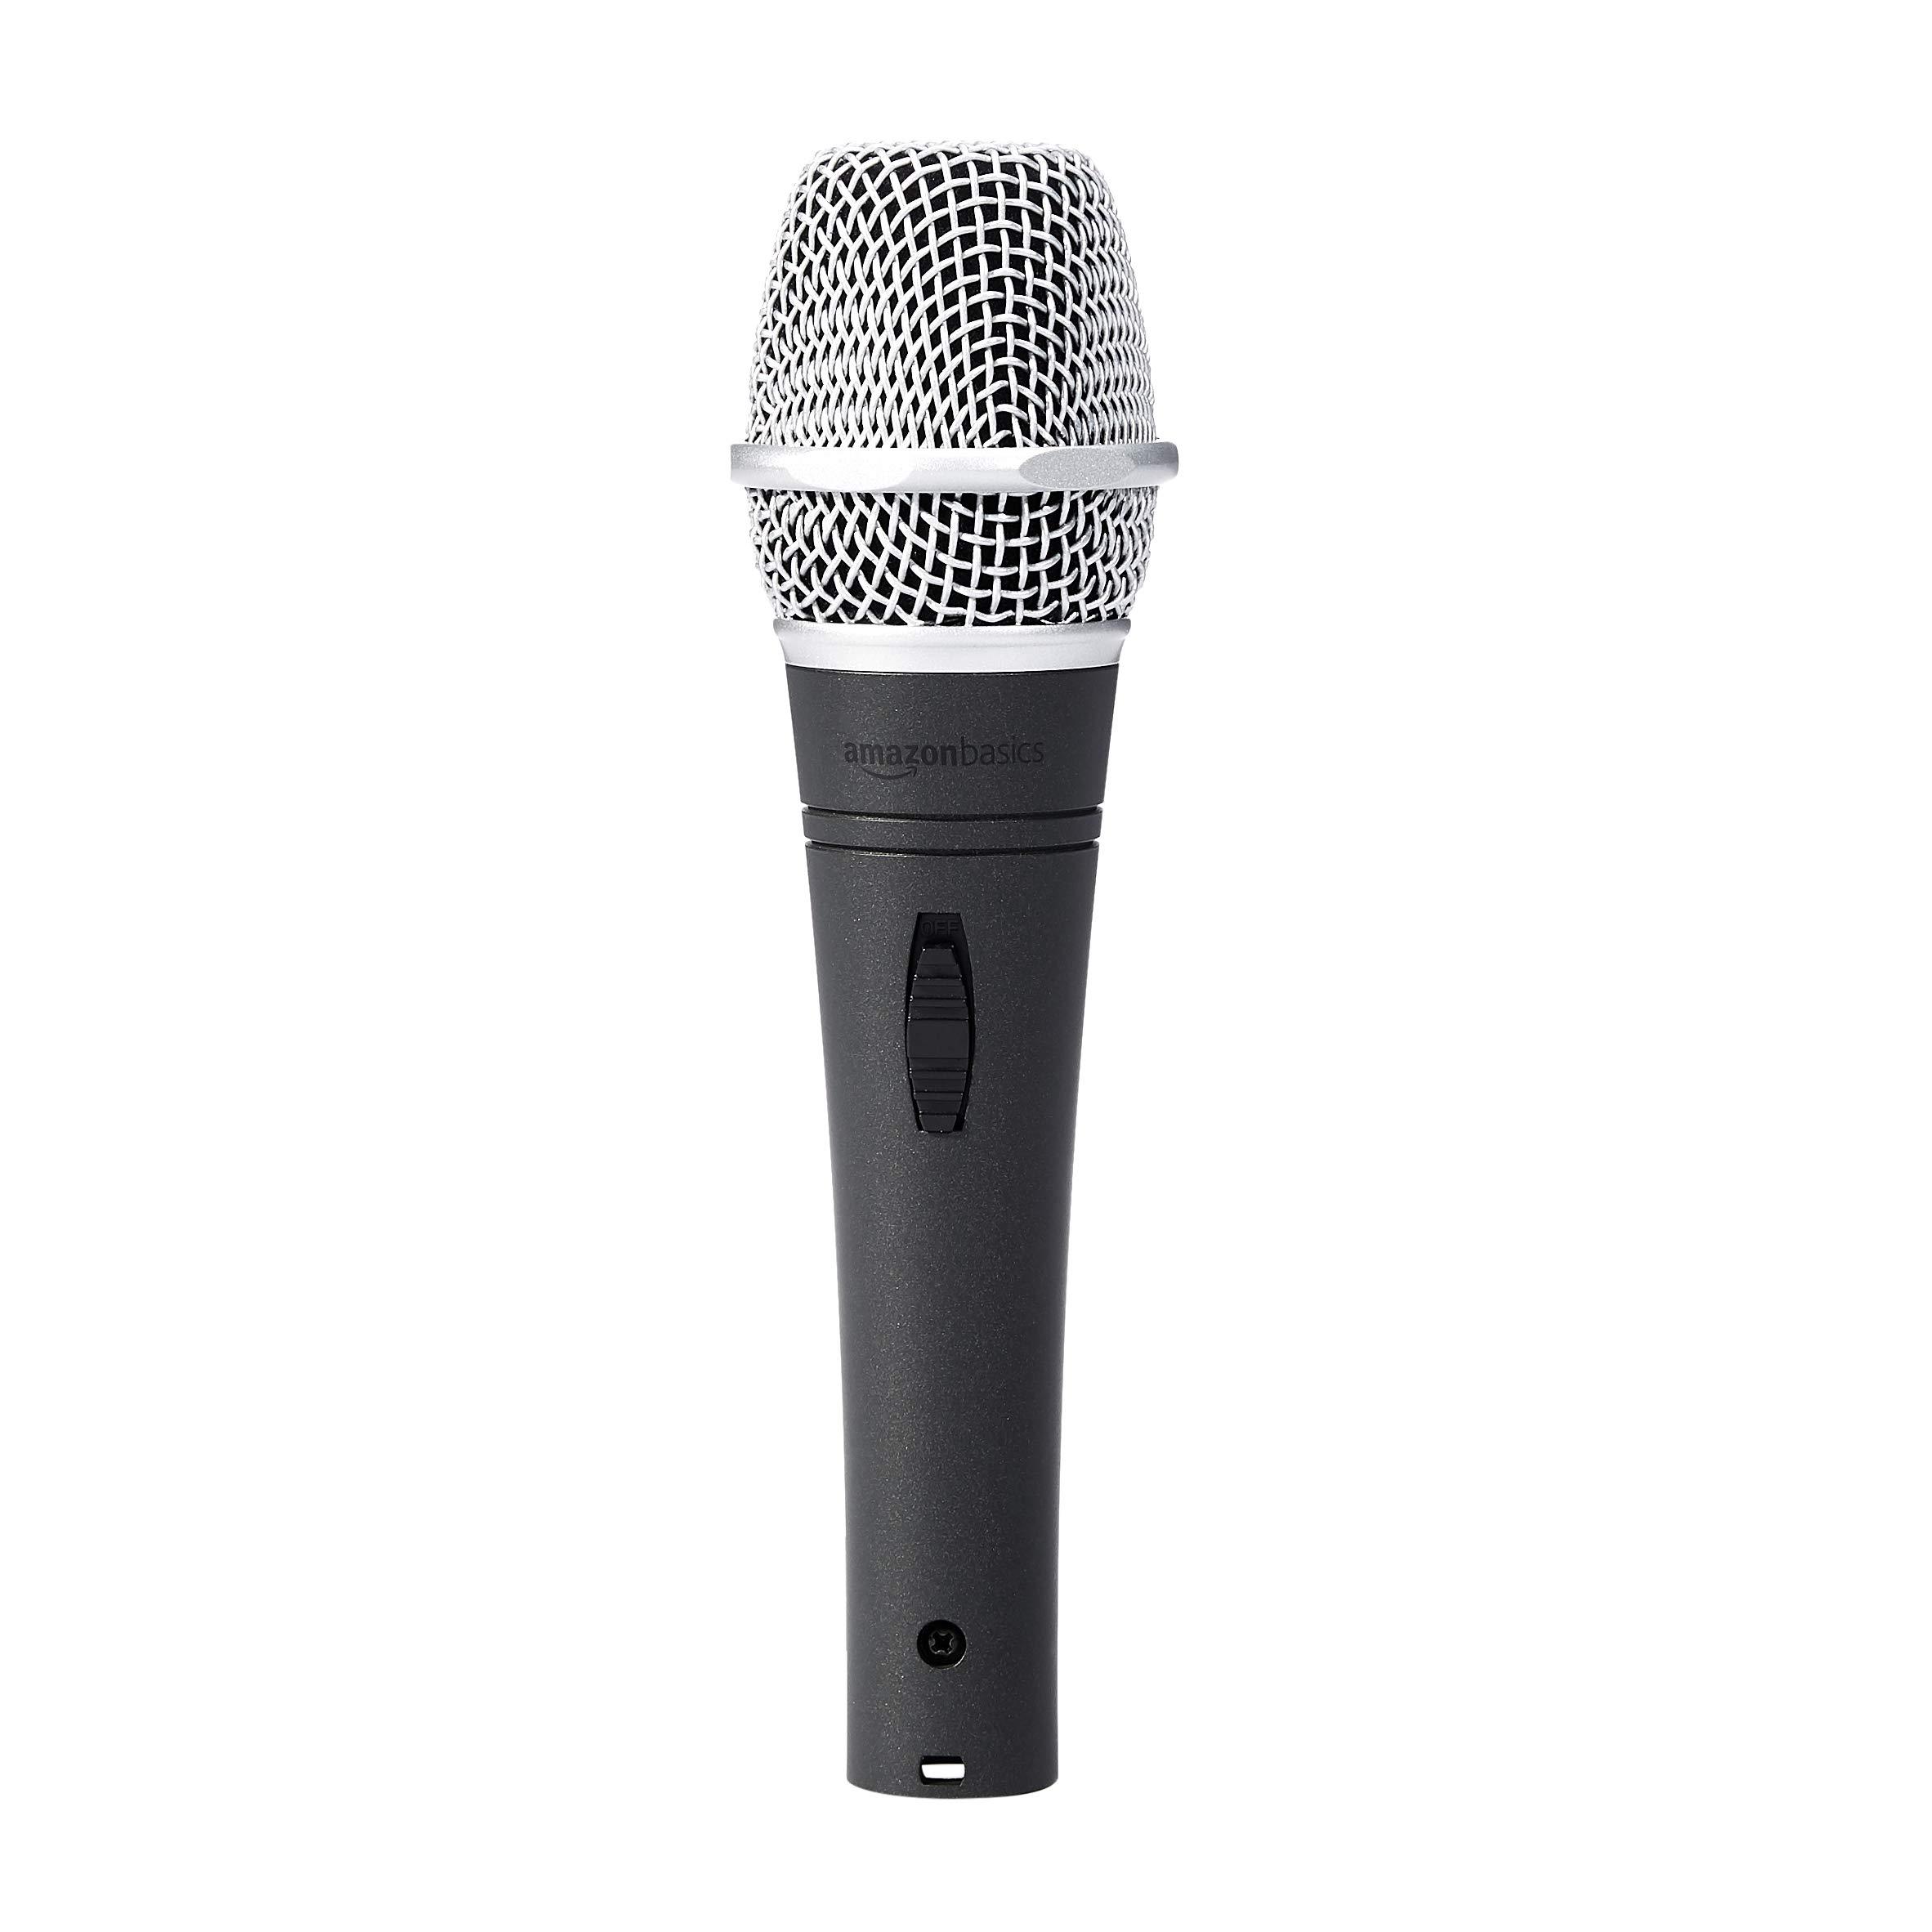 AmazonBasics Dynamic Vocal Microphone, Super Cardioid by AmazonBasics